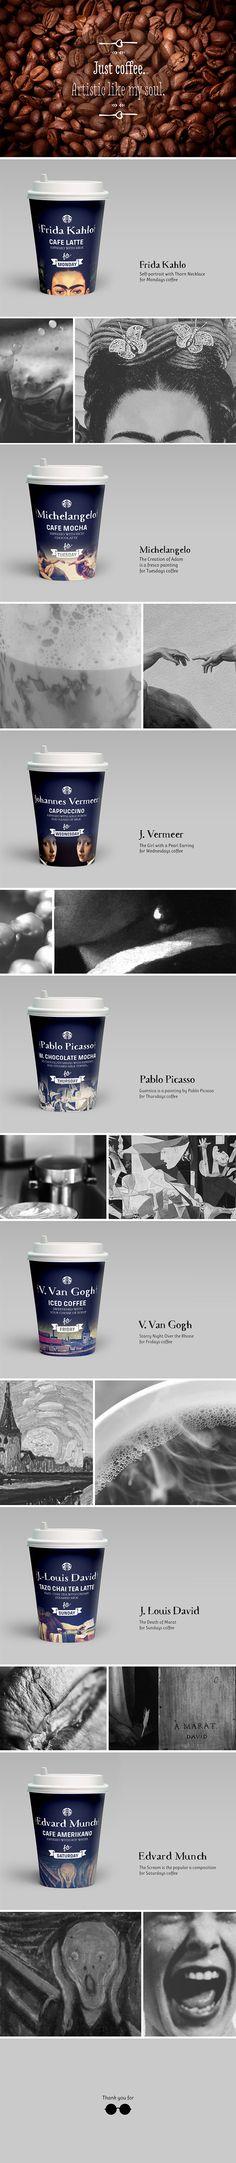 Artistic Coffee Cups by Caga Caga, via Behance